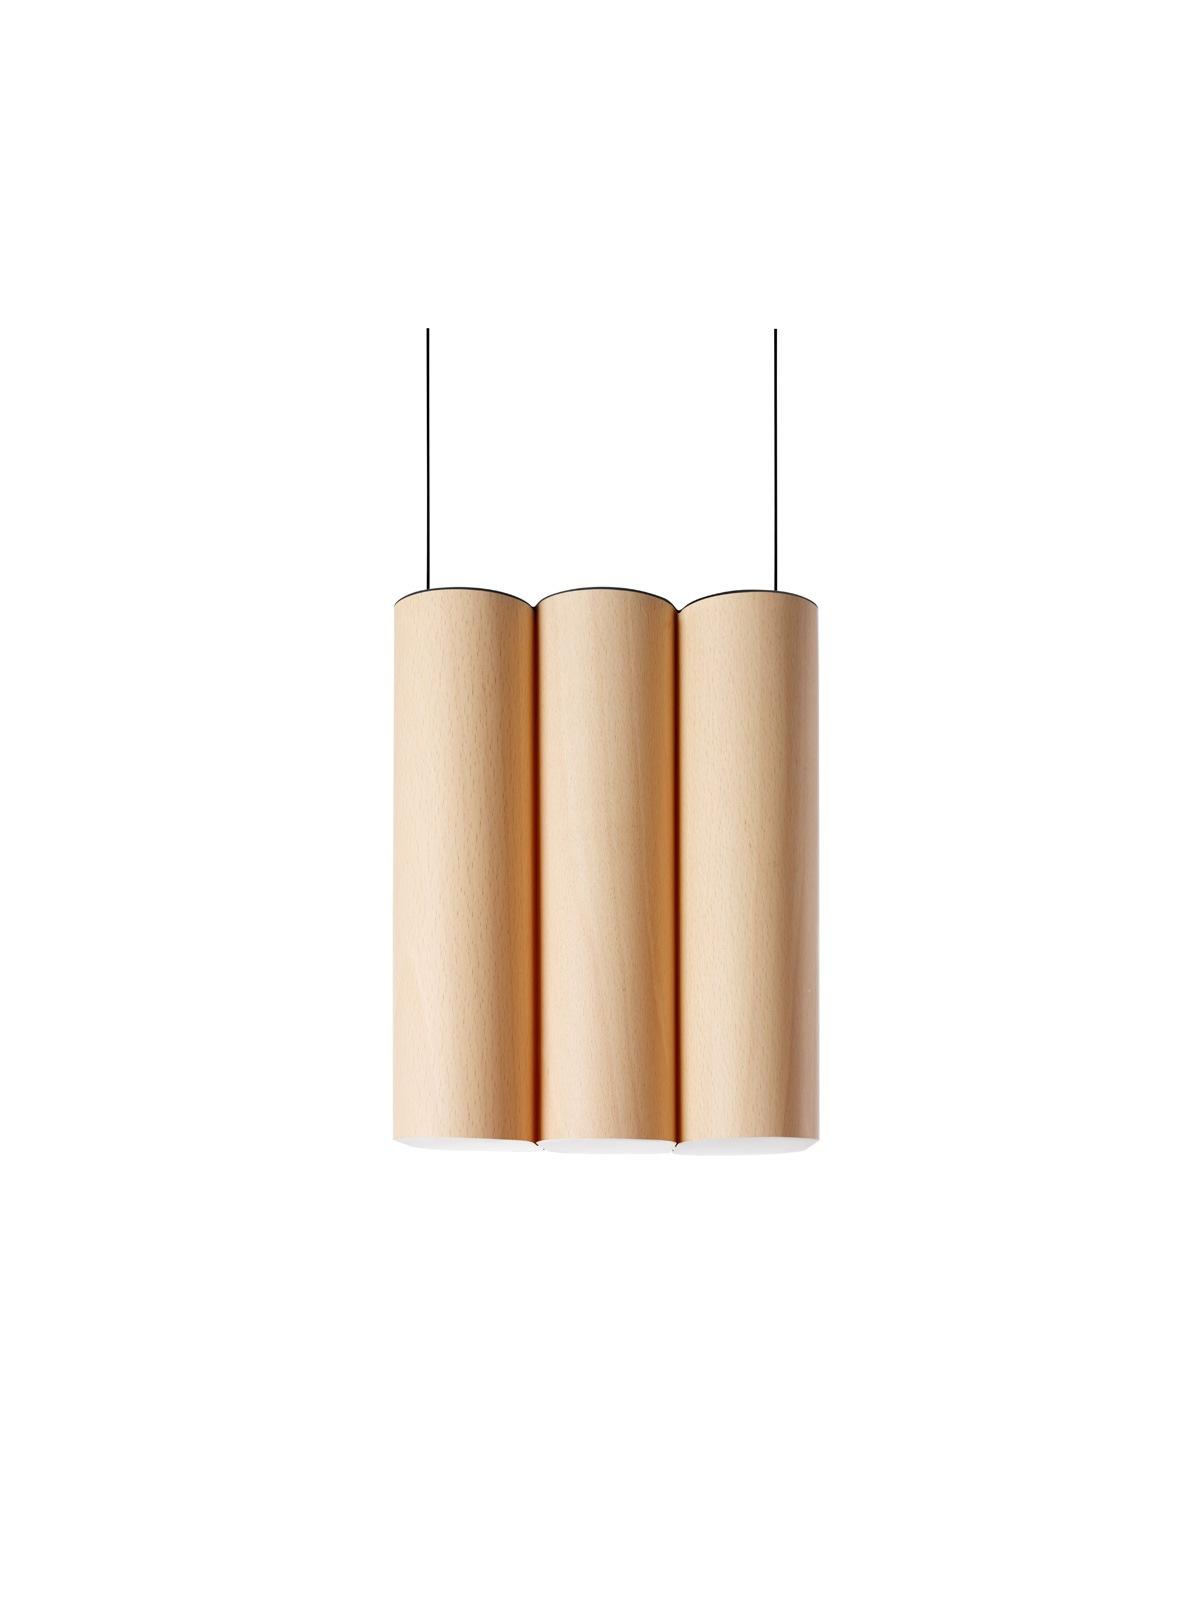 Timo Designerleuchte Holz LZF Lamps DesignOrt